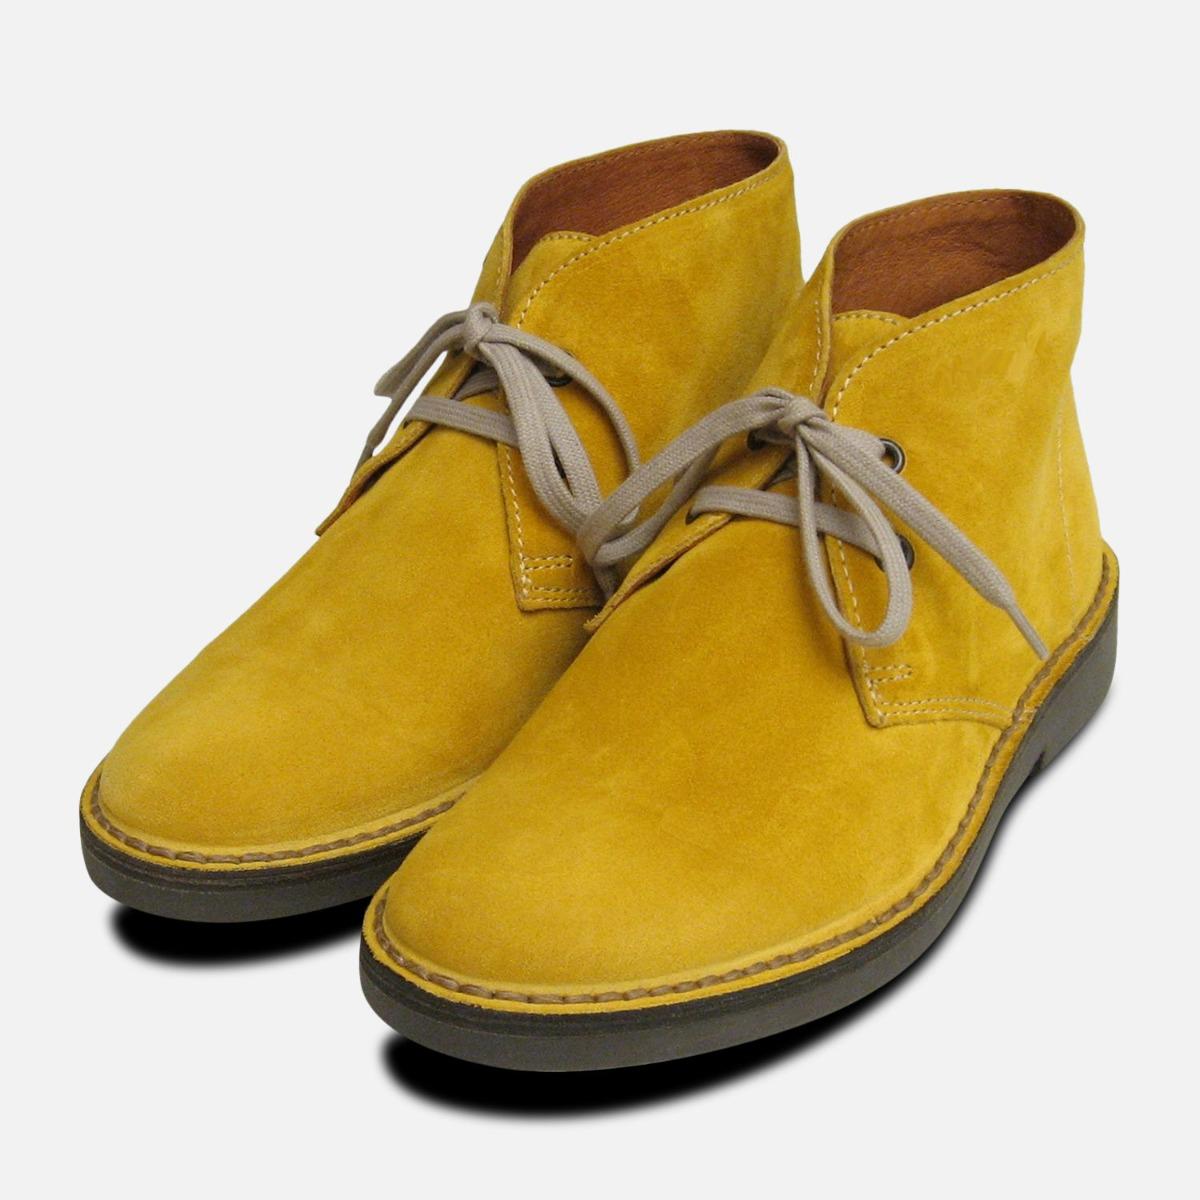 Mustard Yellow Suede Italian Desert